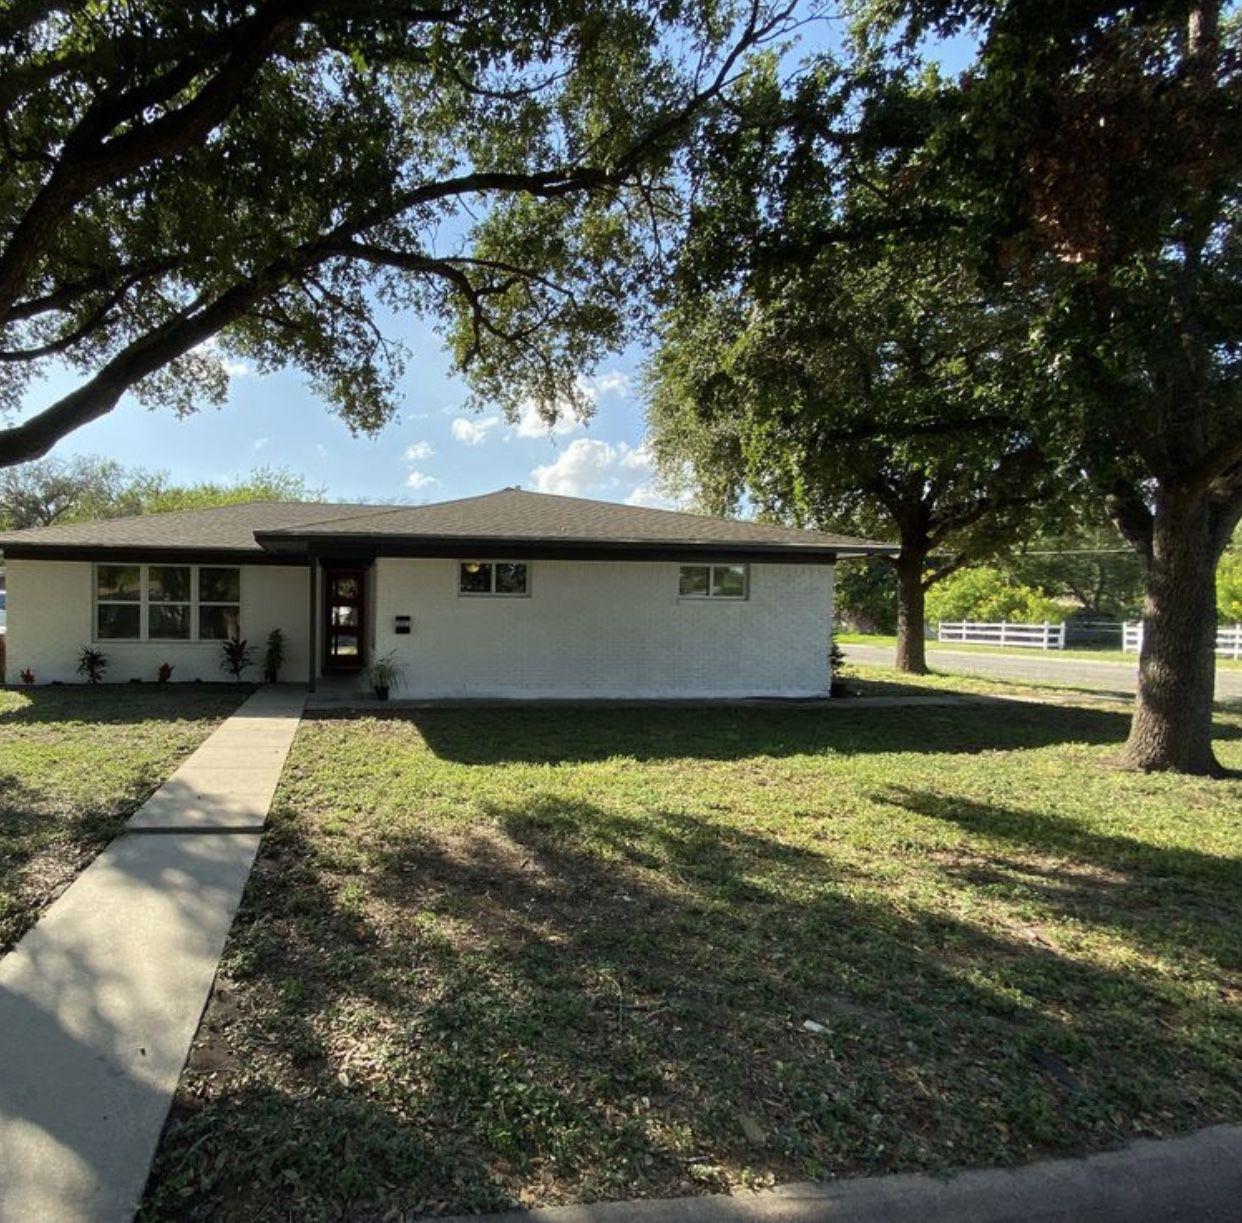 Home for sale! 1021 West Henrietta image 1